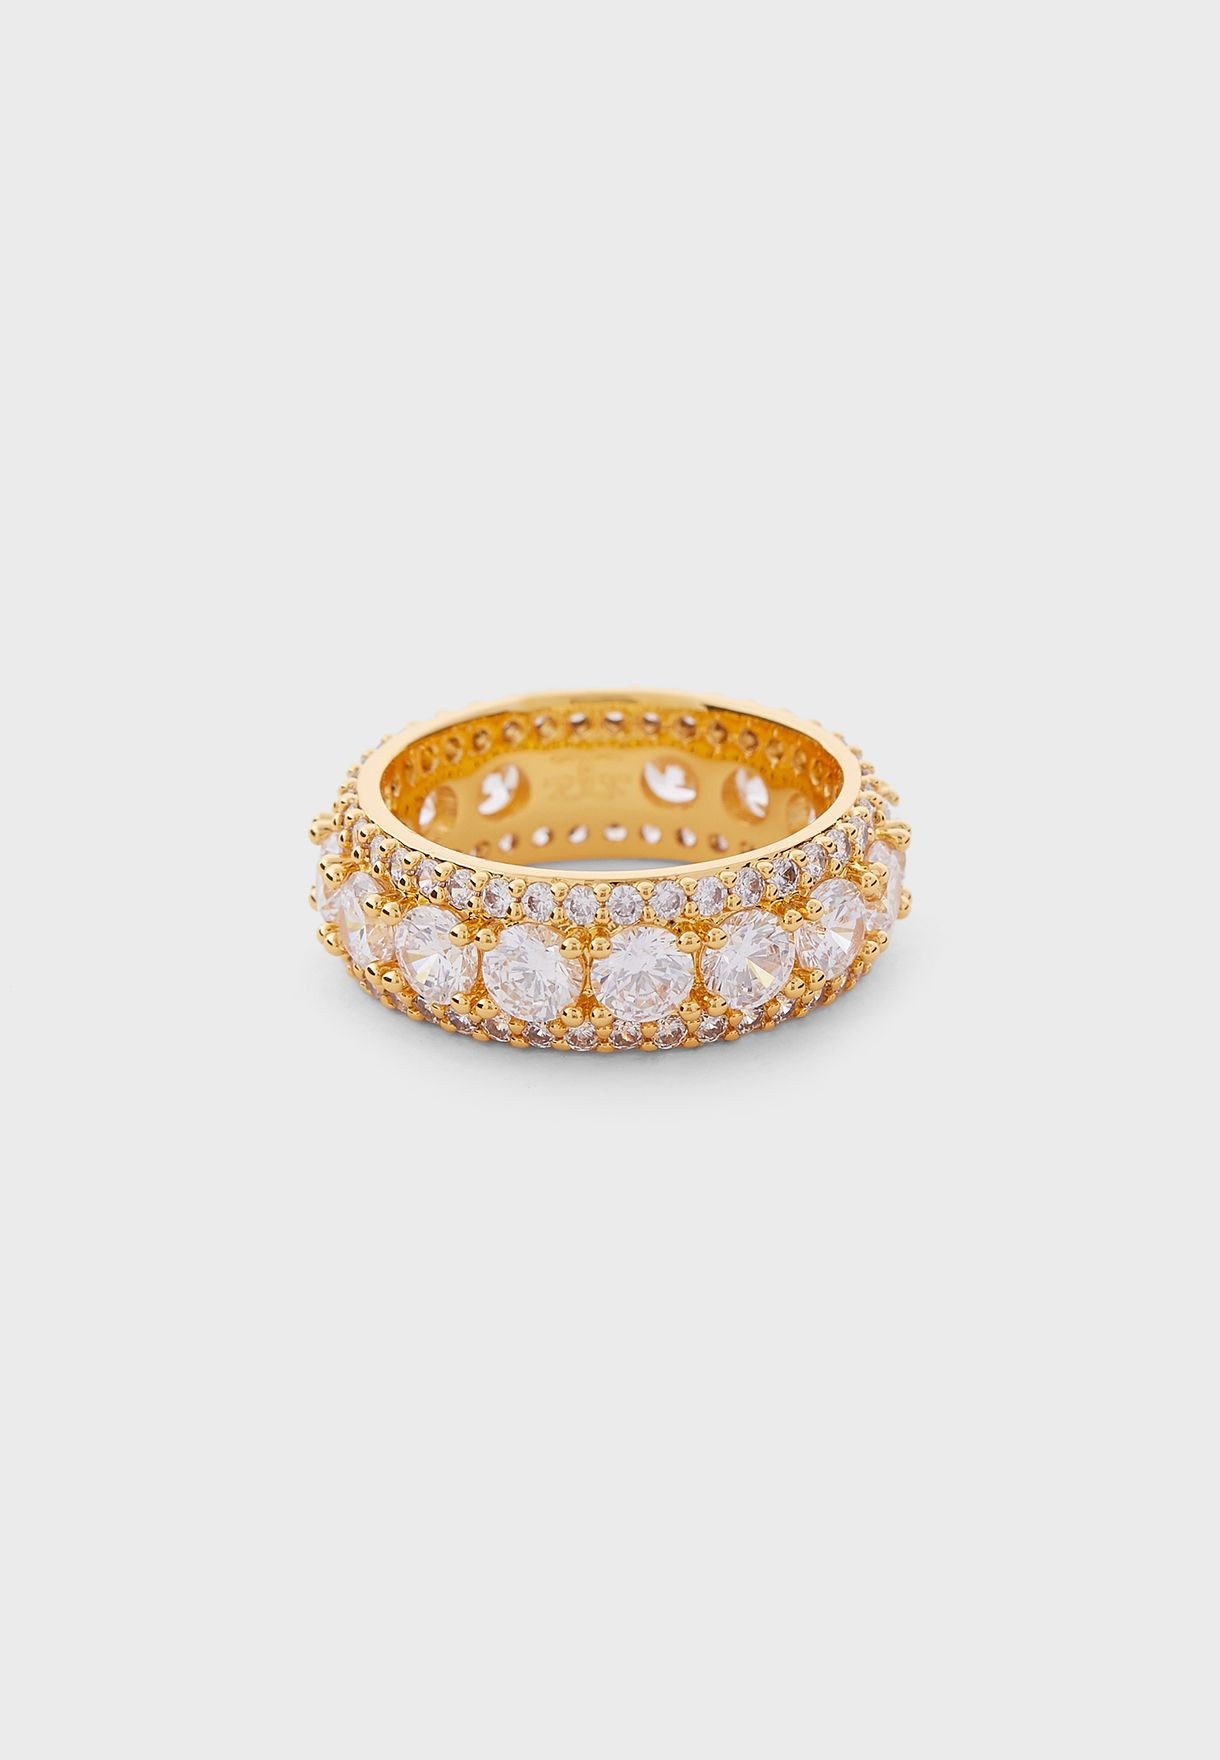 خاتم مرصع مطلي بالذهب